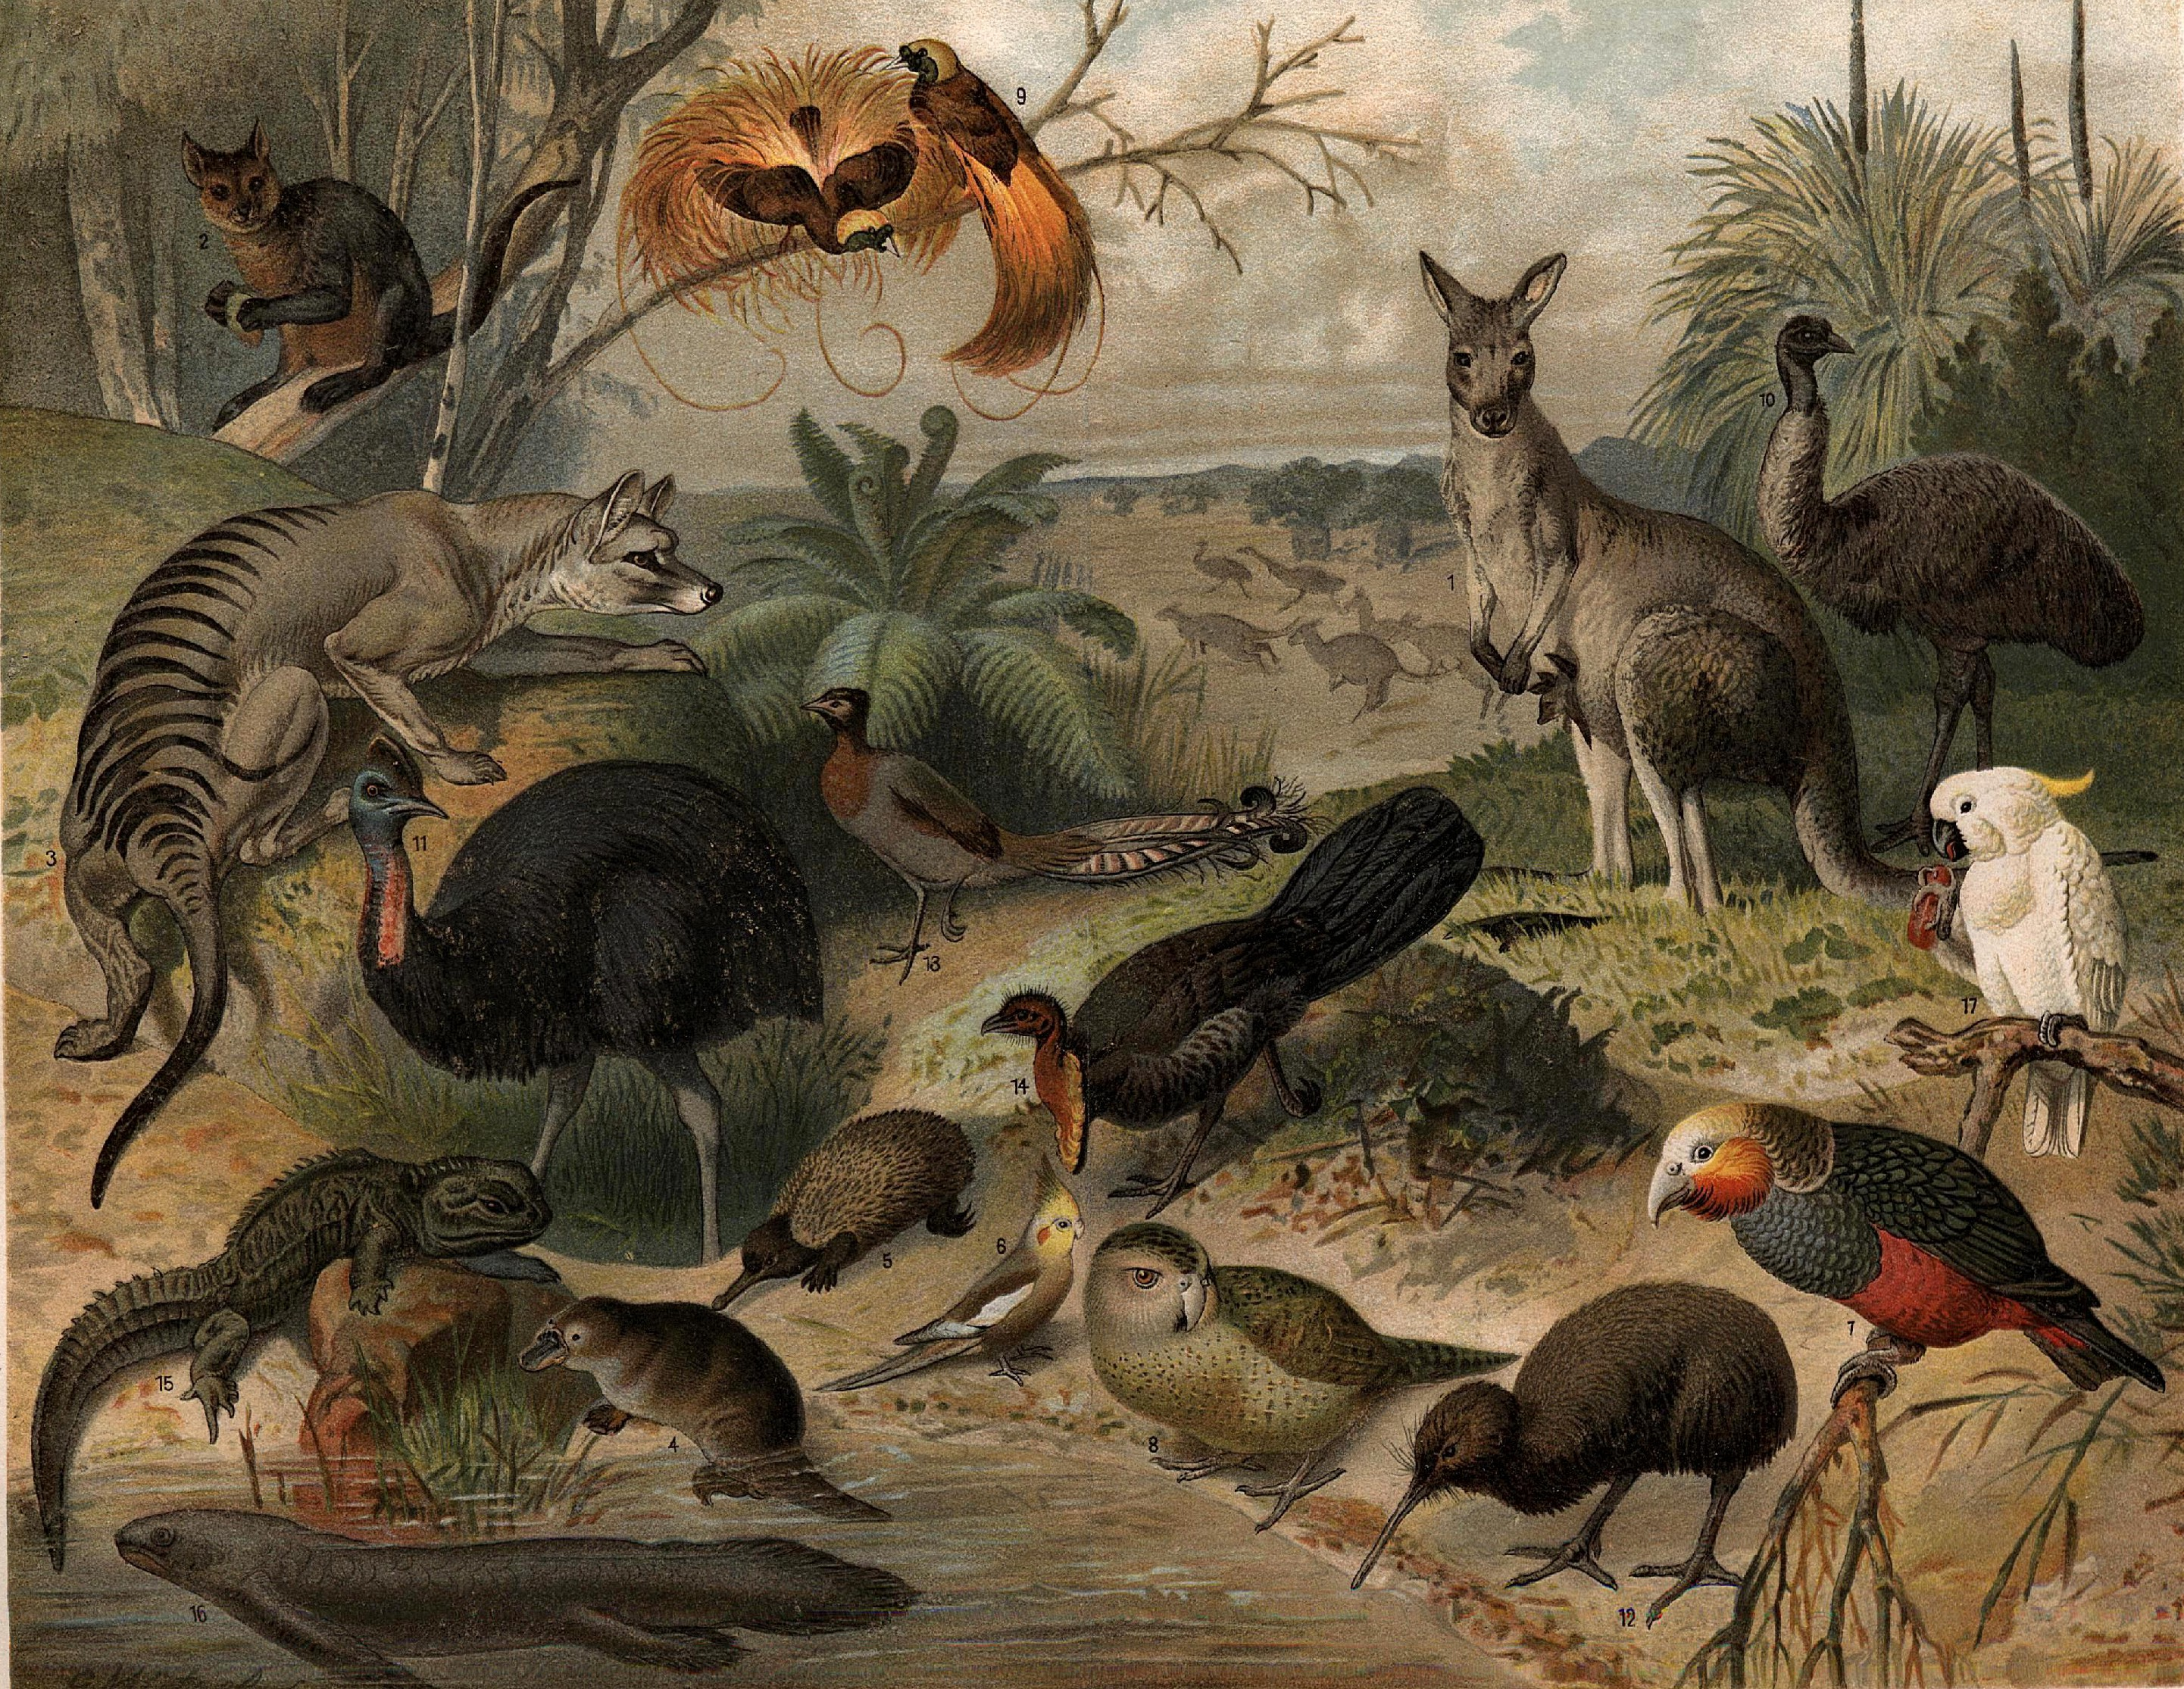 https://i2.wp.com/upload.wikimedia.org/wikipedia/commons/f/fc/Australisk_fauna,_Nordisk_familjebok.jpg